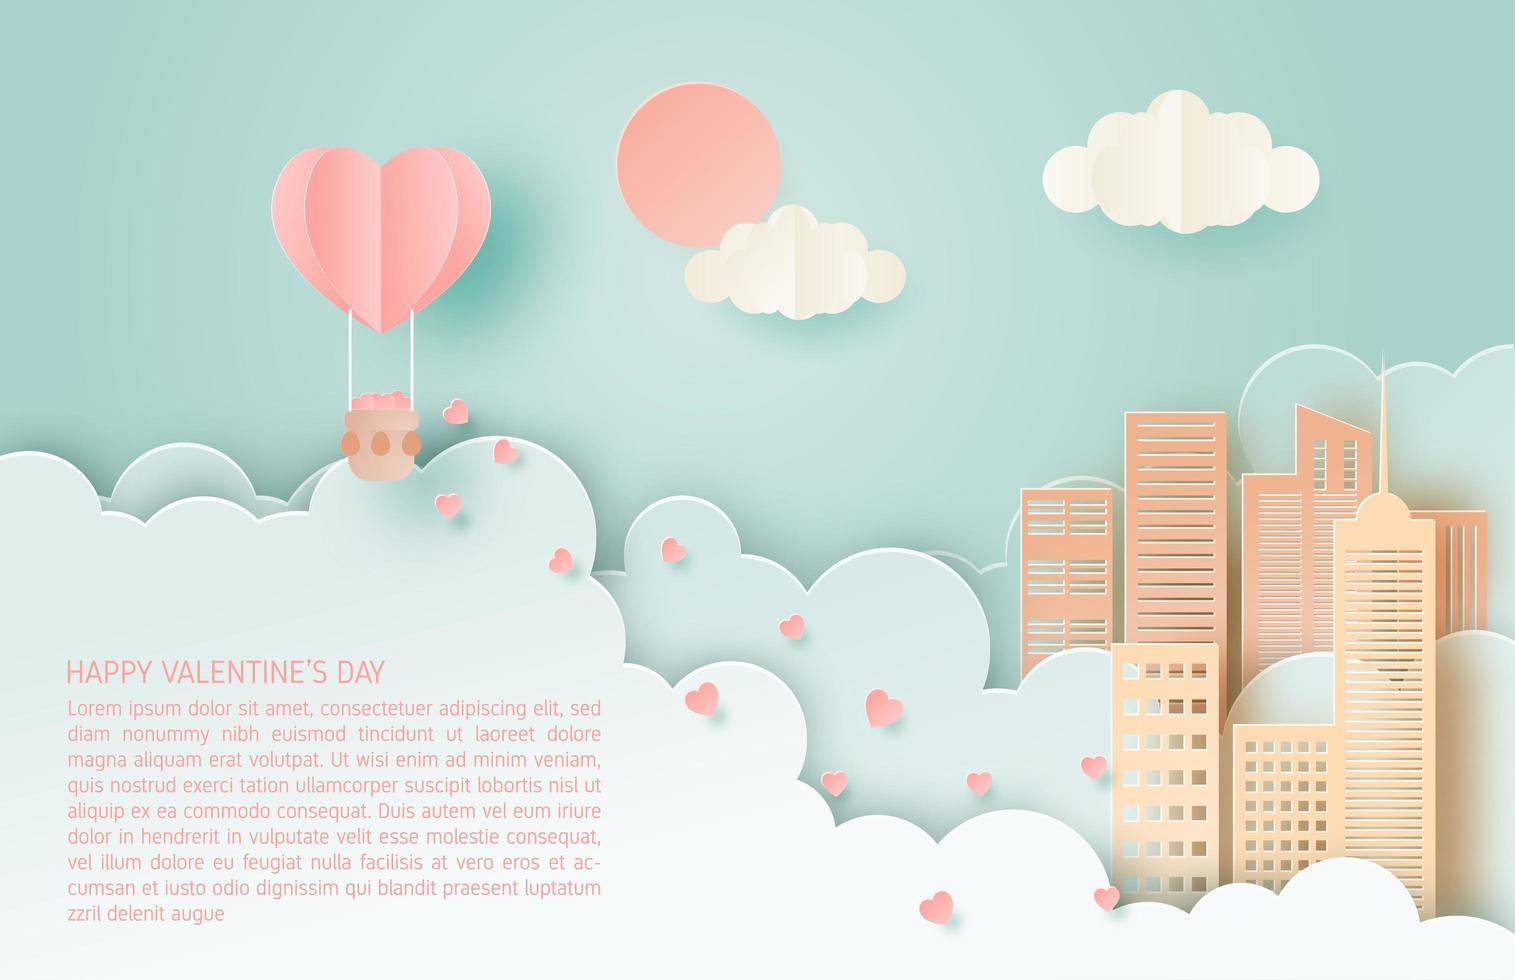 papier kunst luchtballon zwevend boven de stad vector